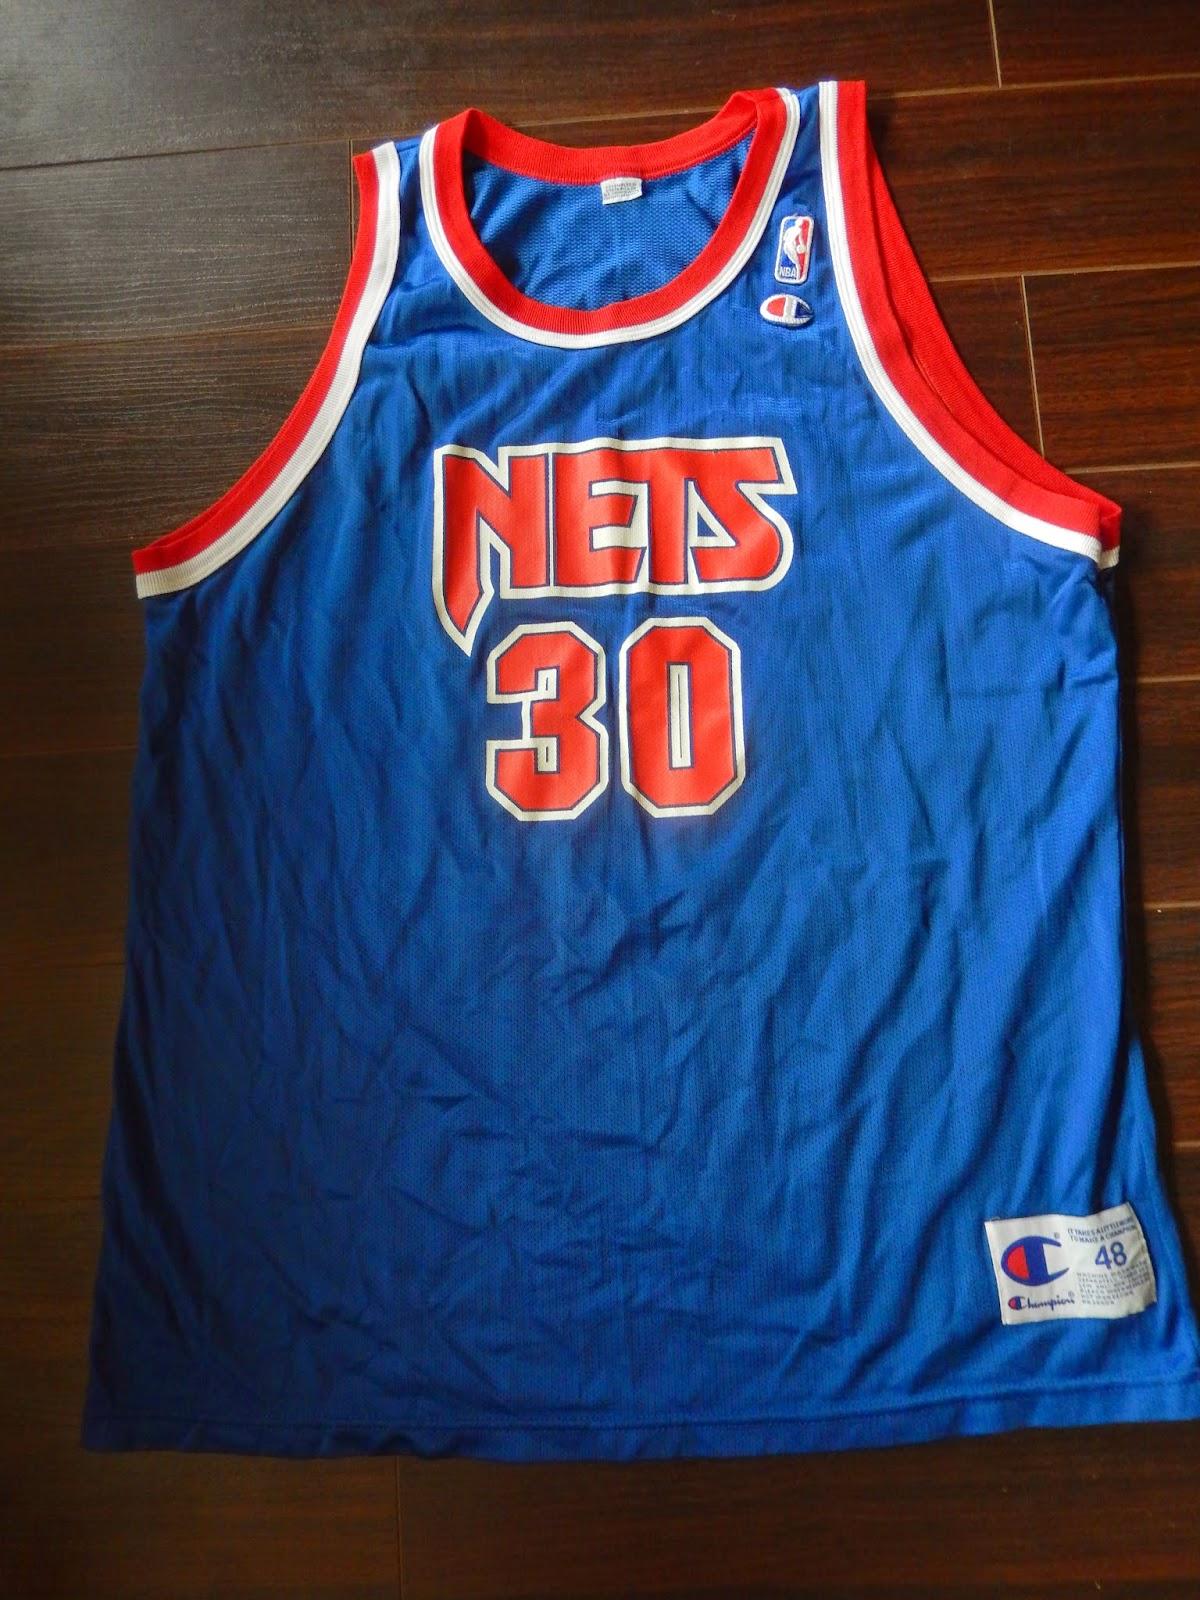 Vintage Kerry Kittles Champion New Jersey Nets Jersey 48 Mens XL e7ec0add4